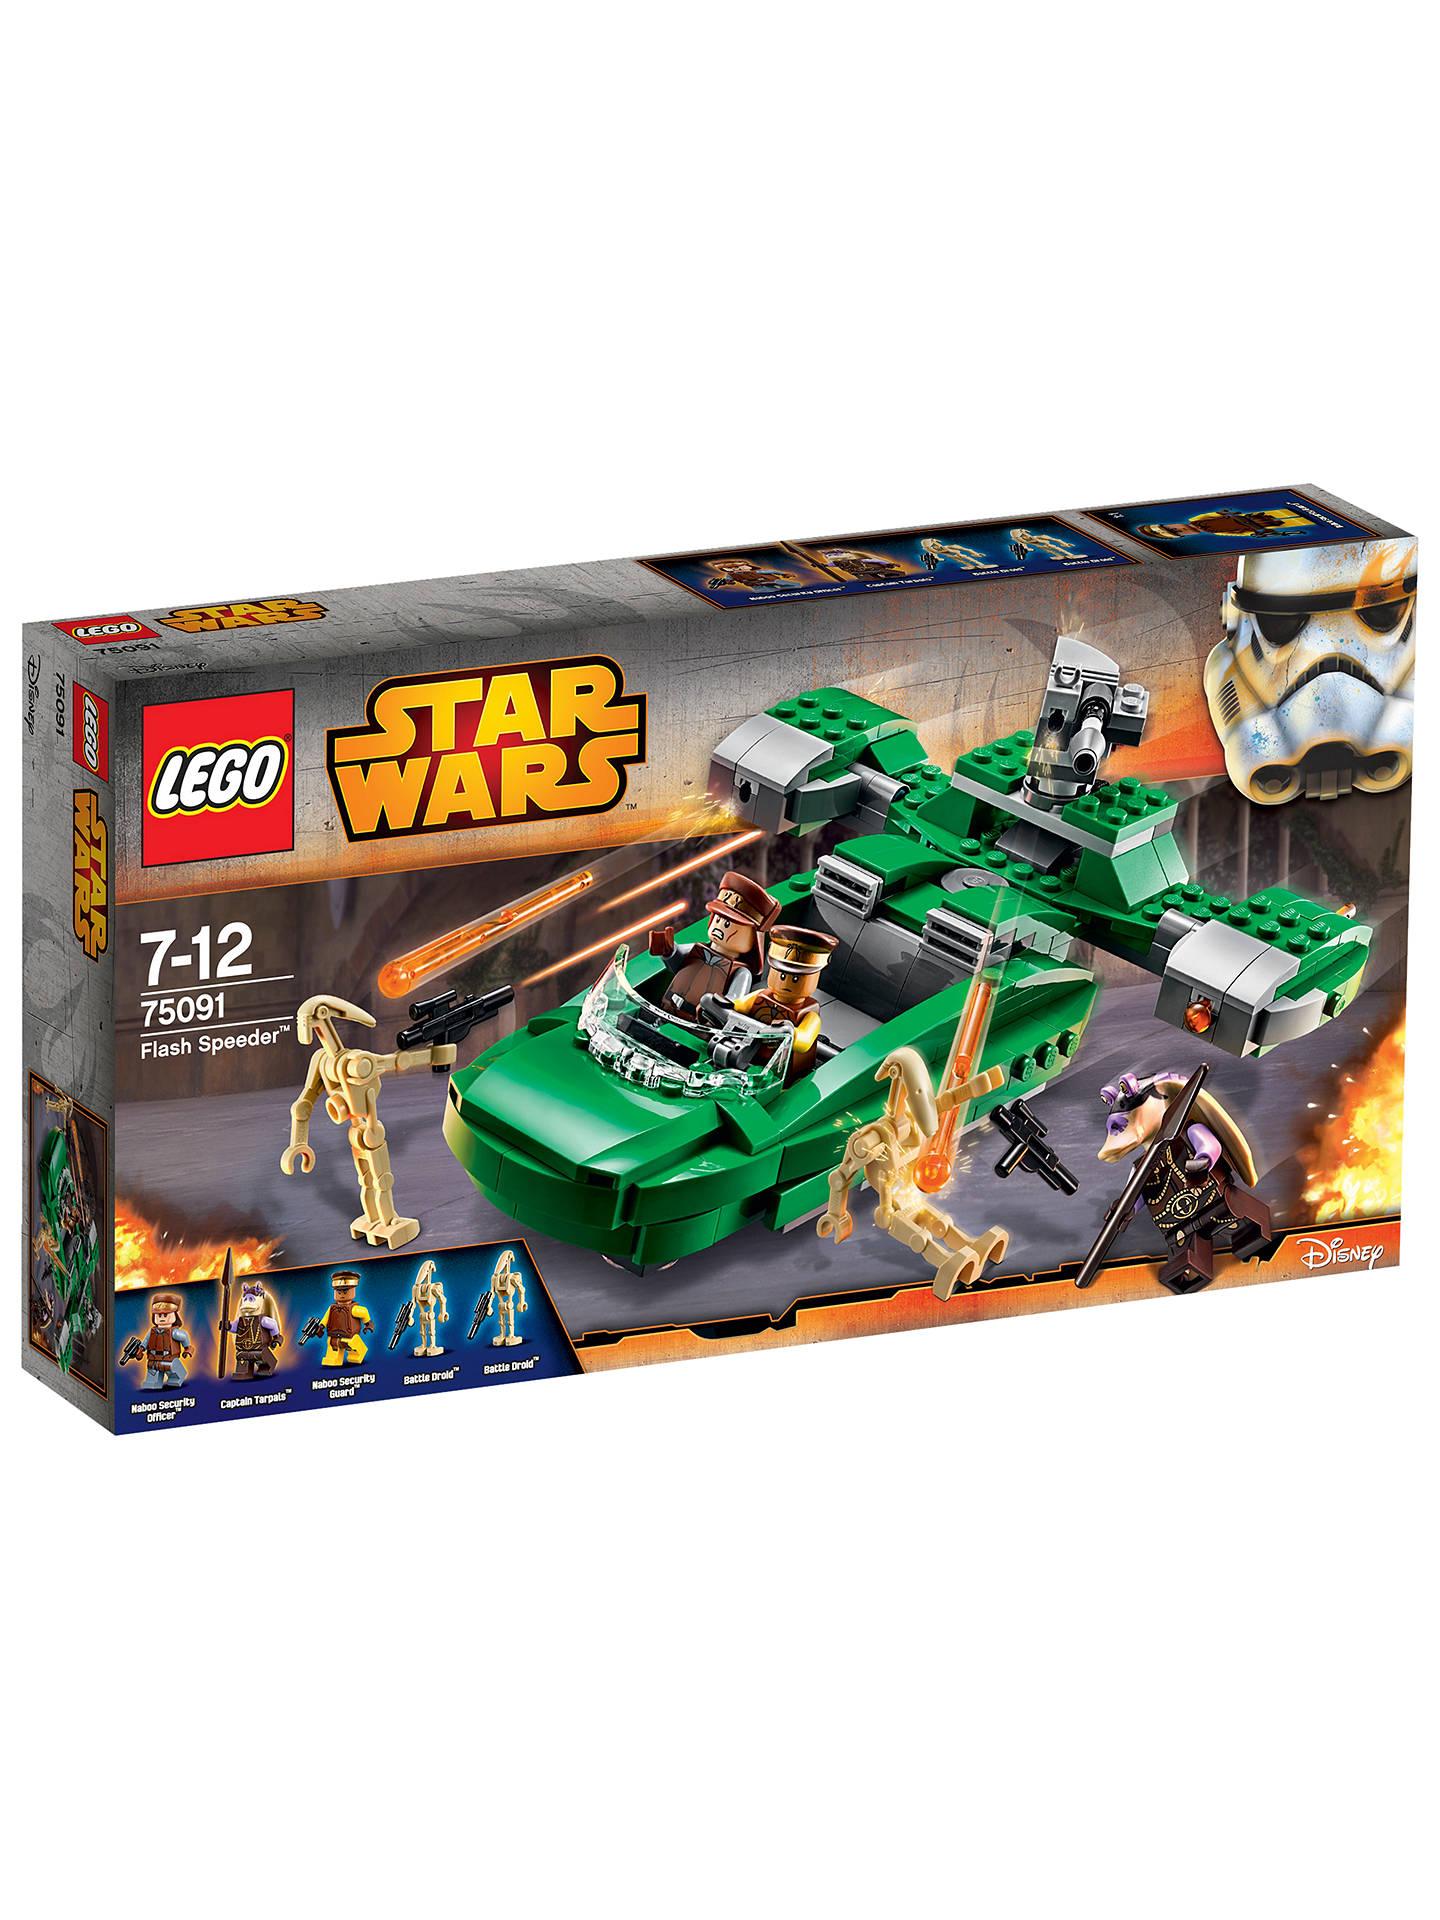 LEGO Star Wars 75091 Flash Speeder at John Lewis & Partners